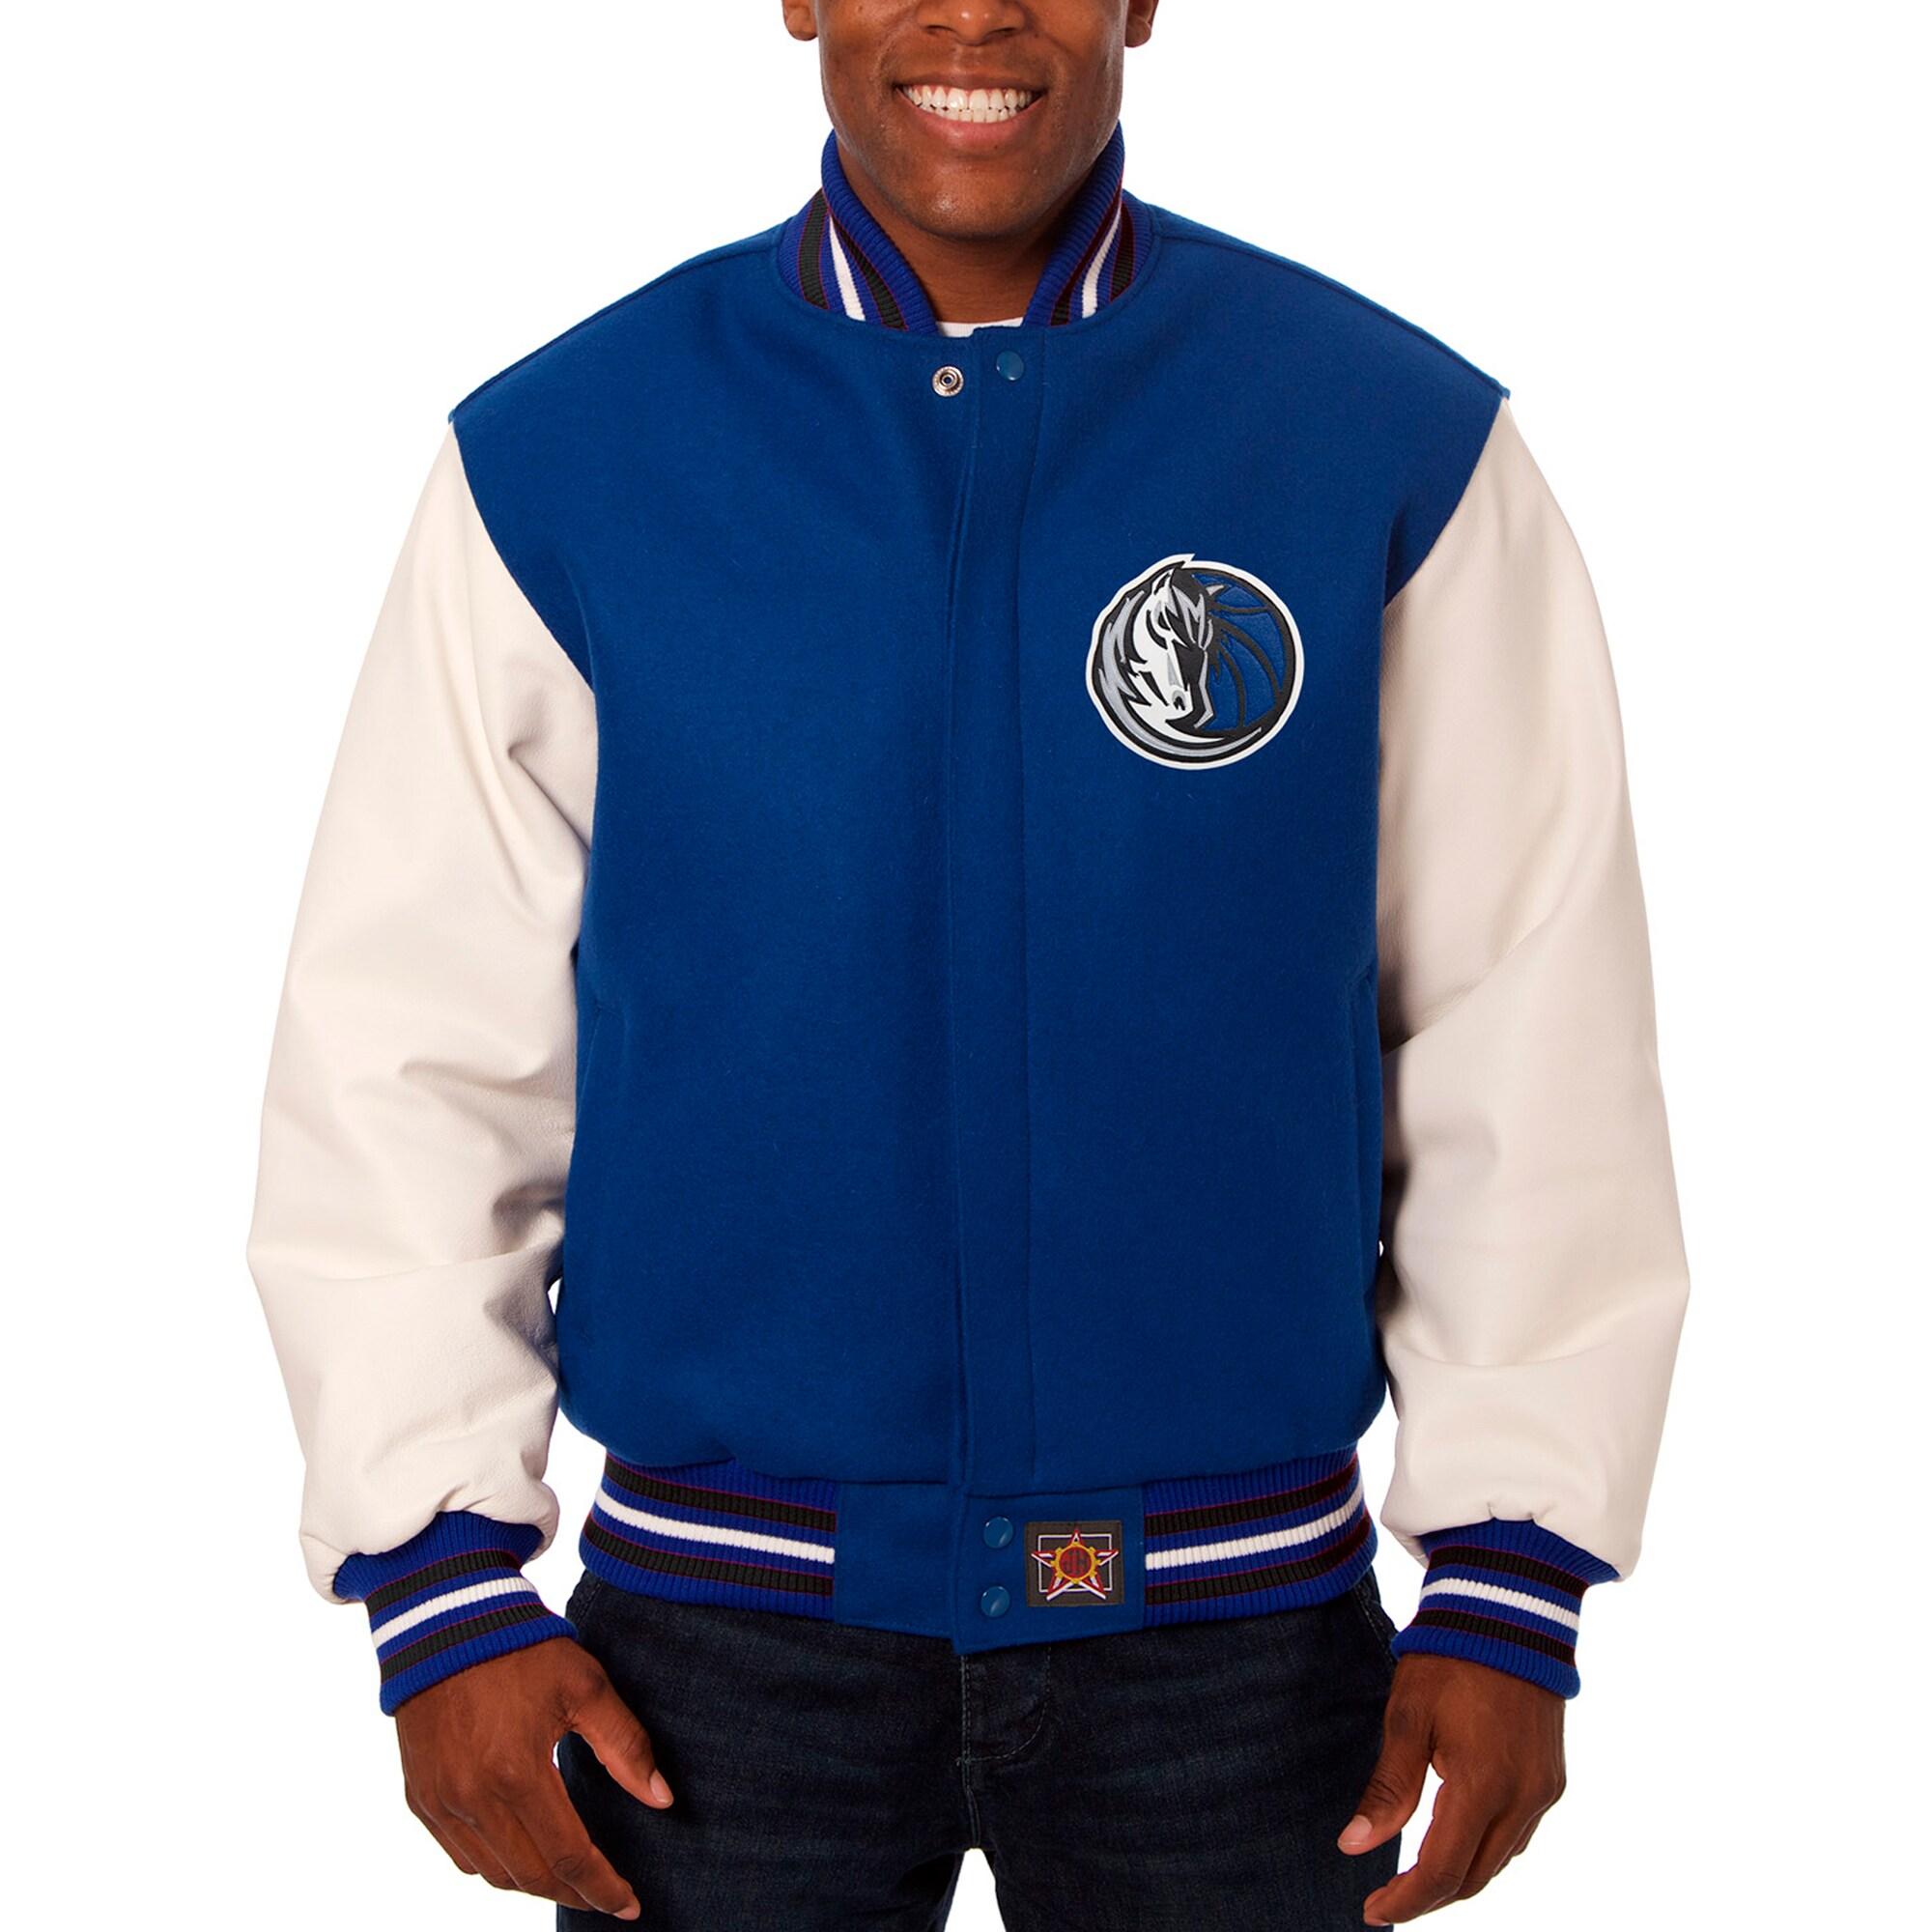 Dallas Mavericks JH Design Big & Tall Wool & Leather Full-Snap Jacket - Blue/White